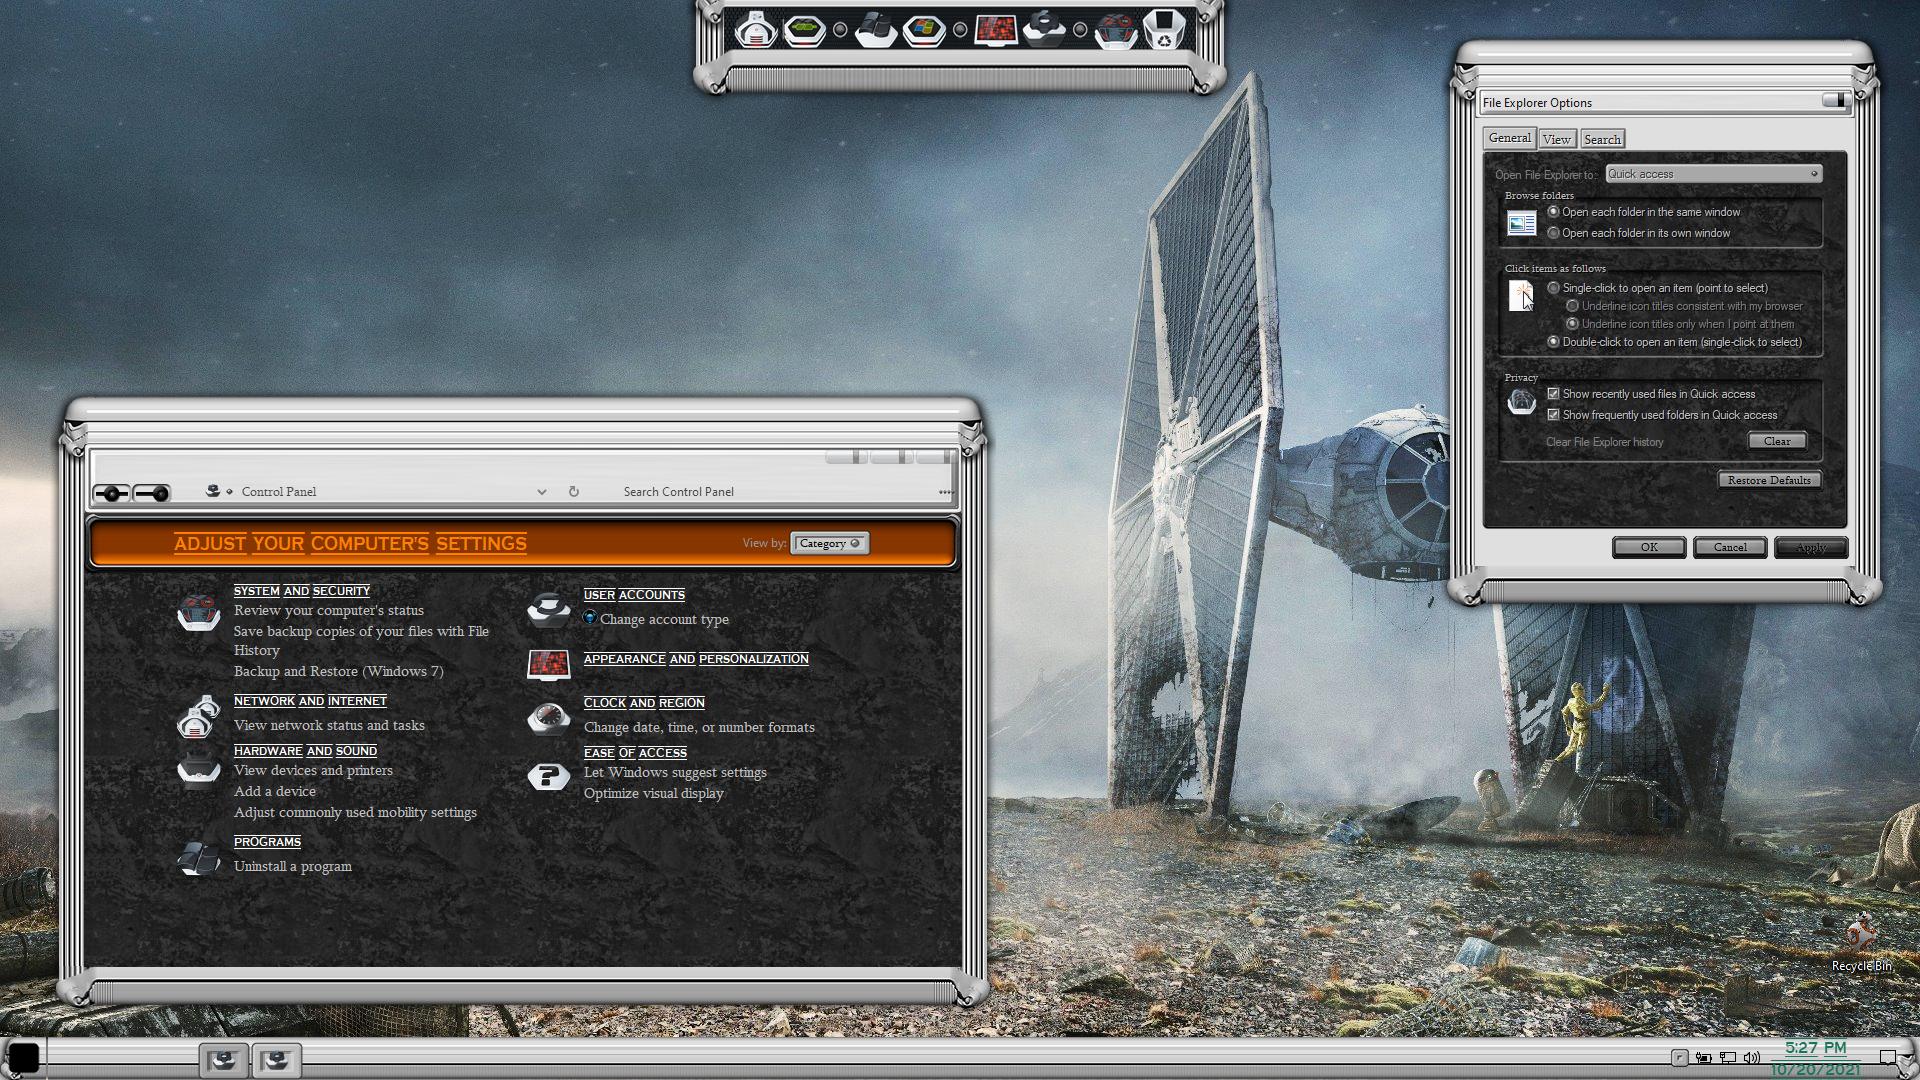 Star Wars Premium SkinPack for Windows 10